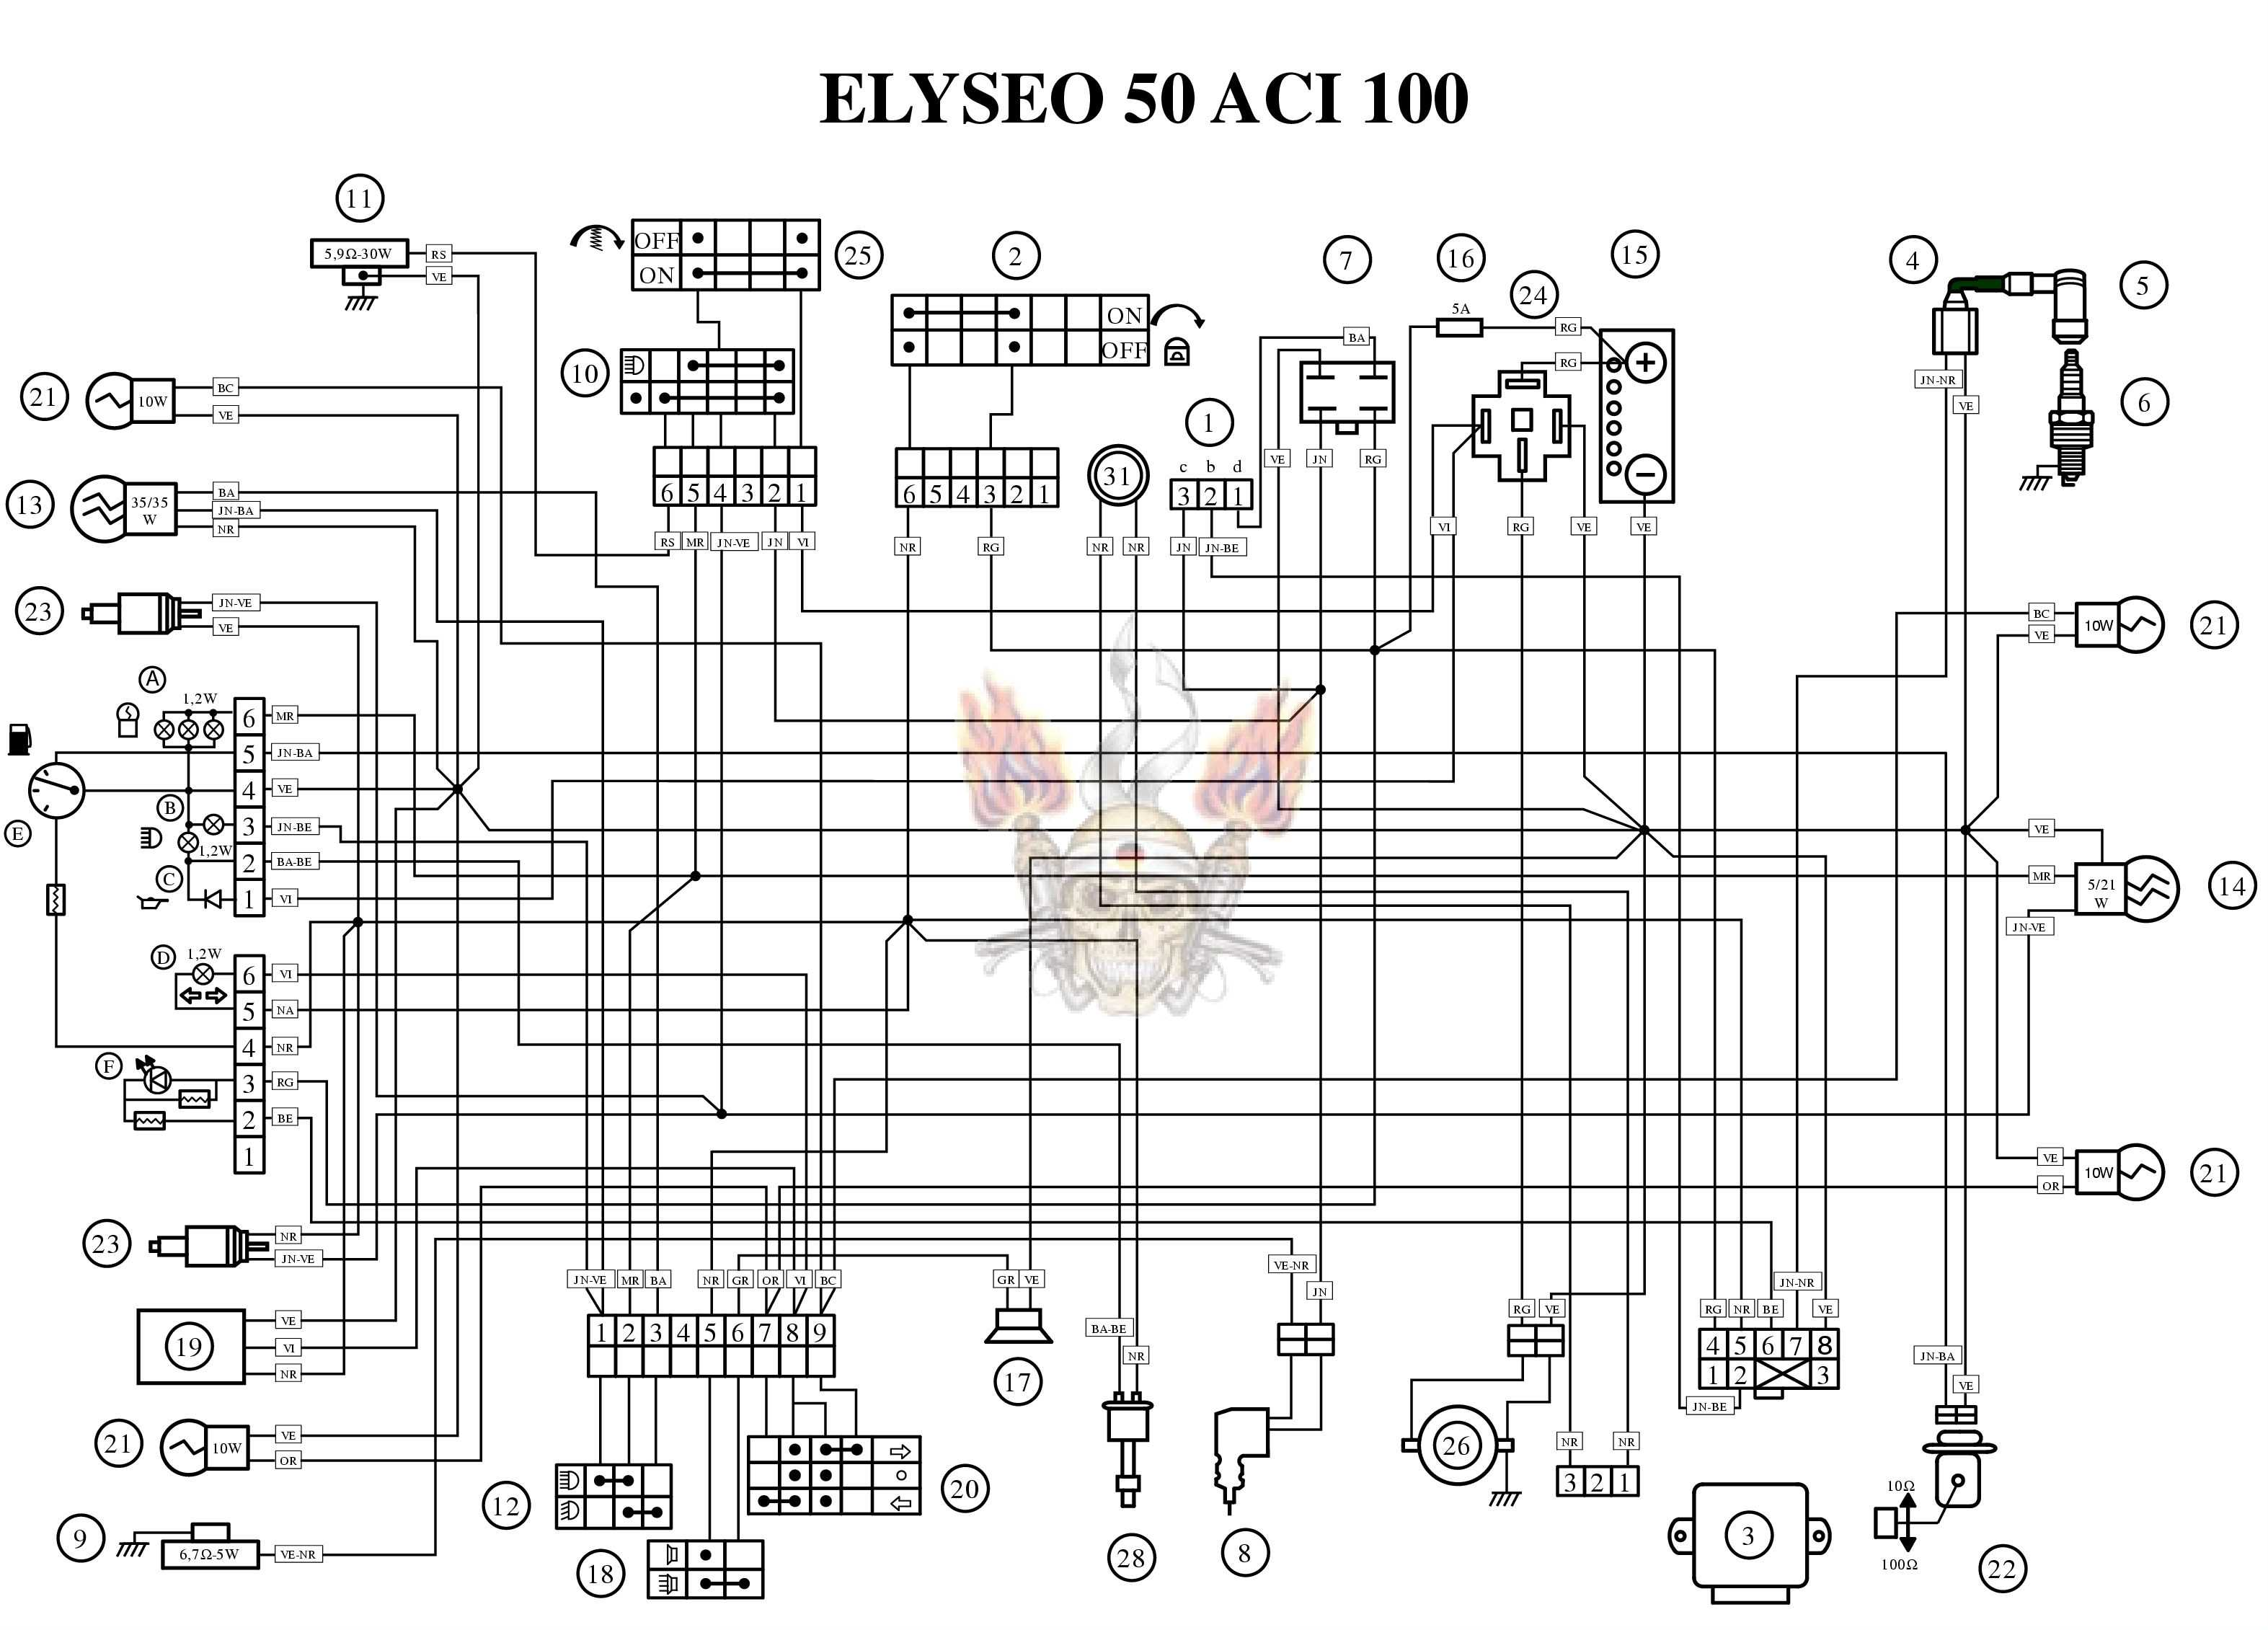 Wiring Diagram Peugeot ELYSEO 50 ACI 100?t\\\\\\=1485078190 peugeot 308 wiring diagram download wiring diagram and schematic c90 wiring diagram at highcare.asia